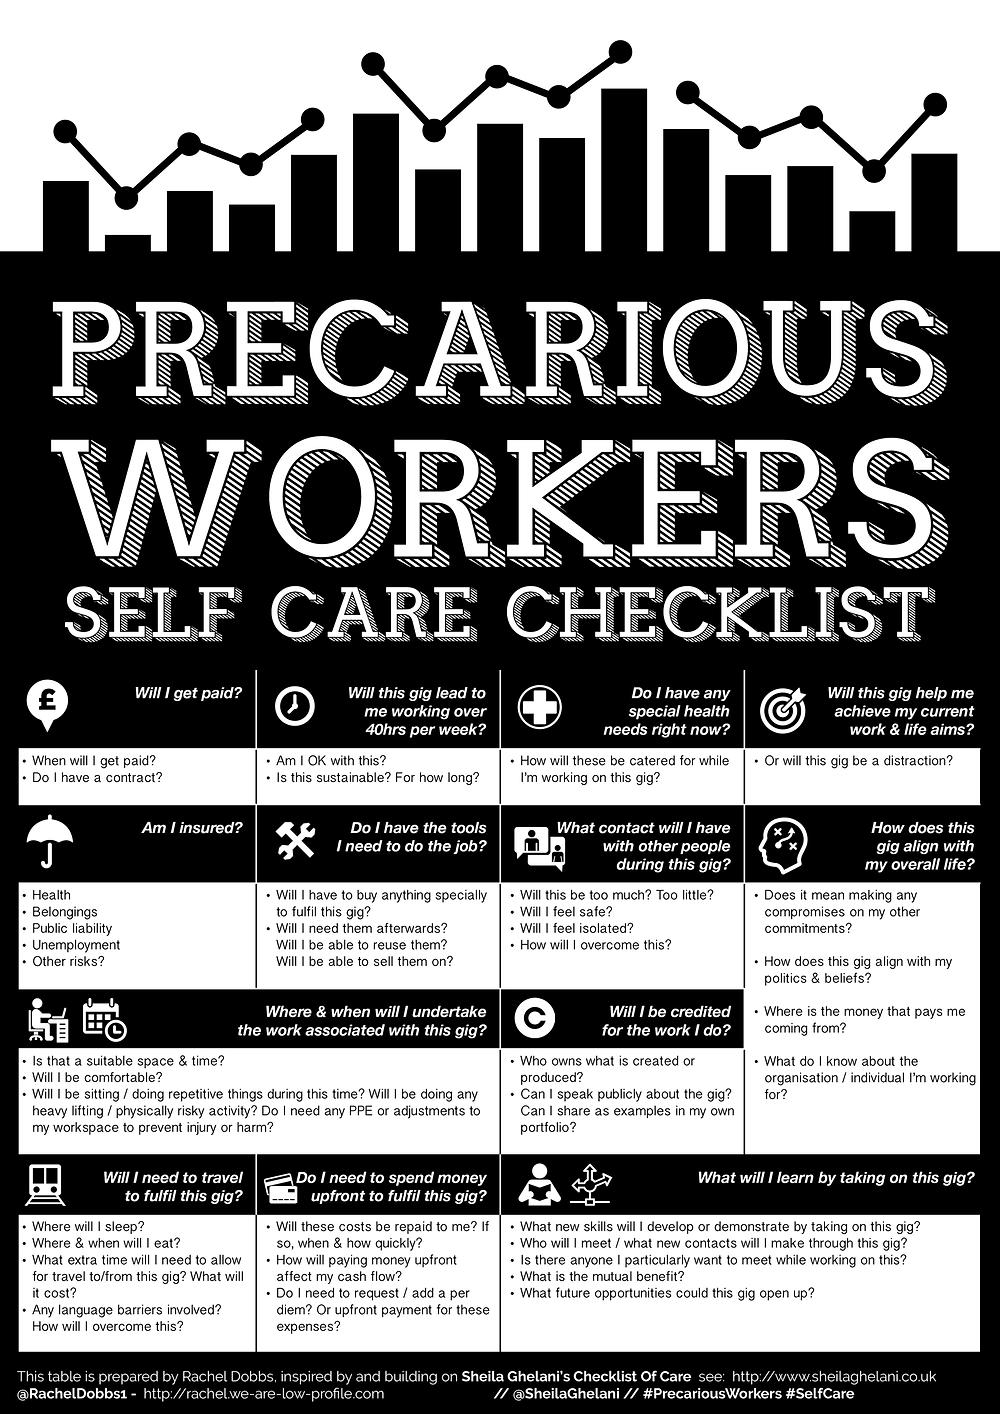 Rachel Dobbs (2018) Self Care Checklist for Precarious Workers